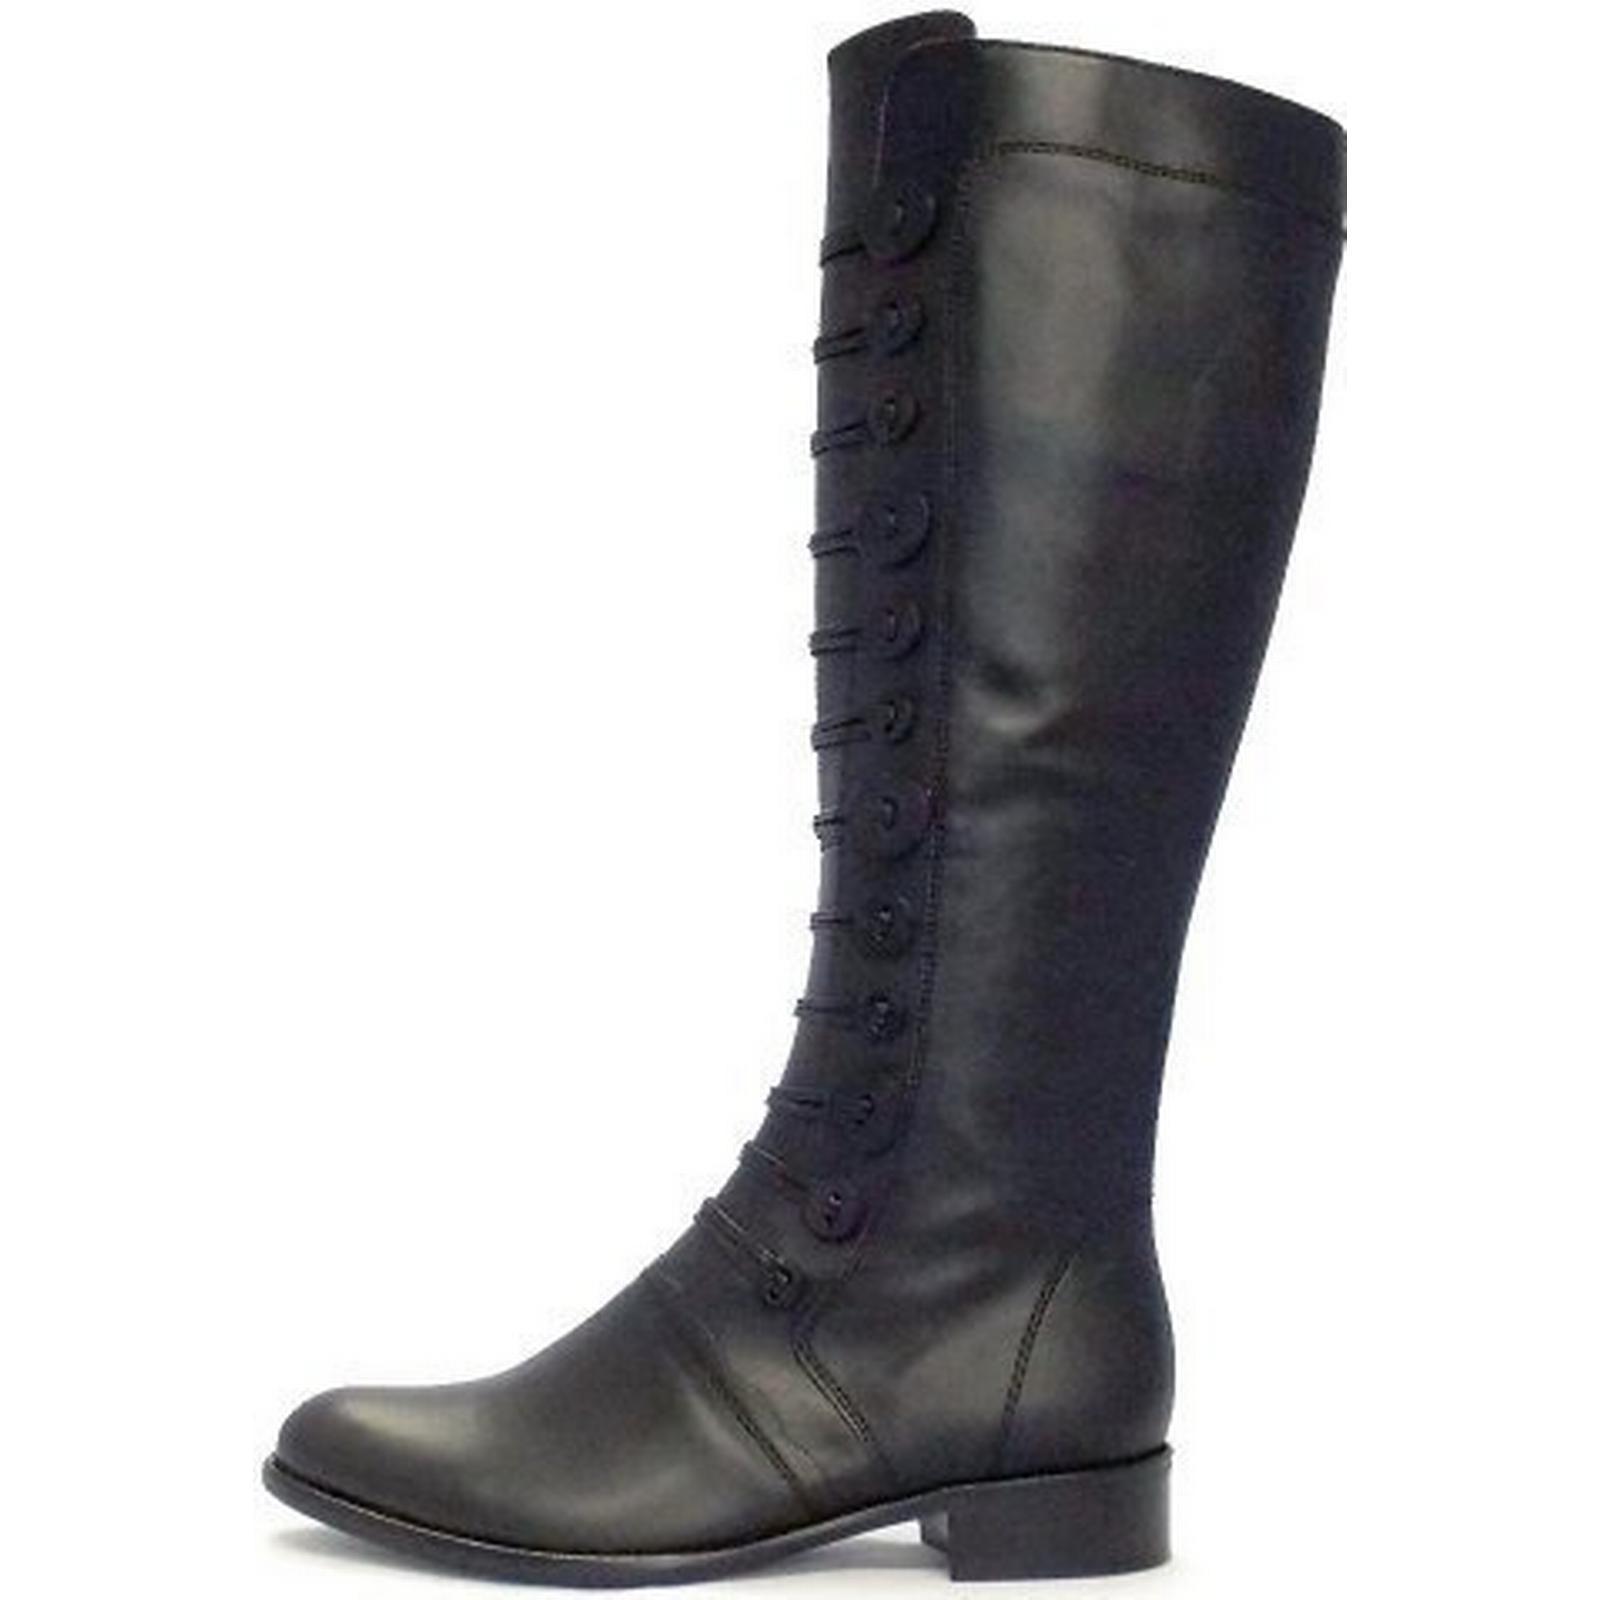 Gabor Argyll Womens Long Boot In Black Size: 6.5, Colour: BLACK BLACK Colour: 1bf855